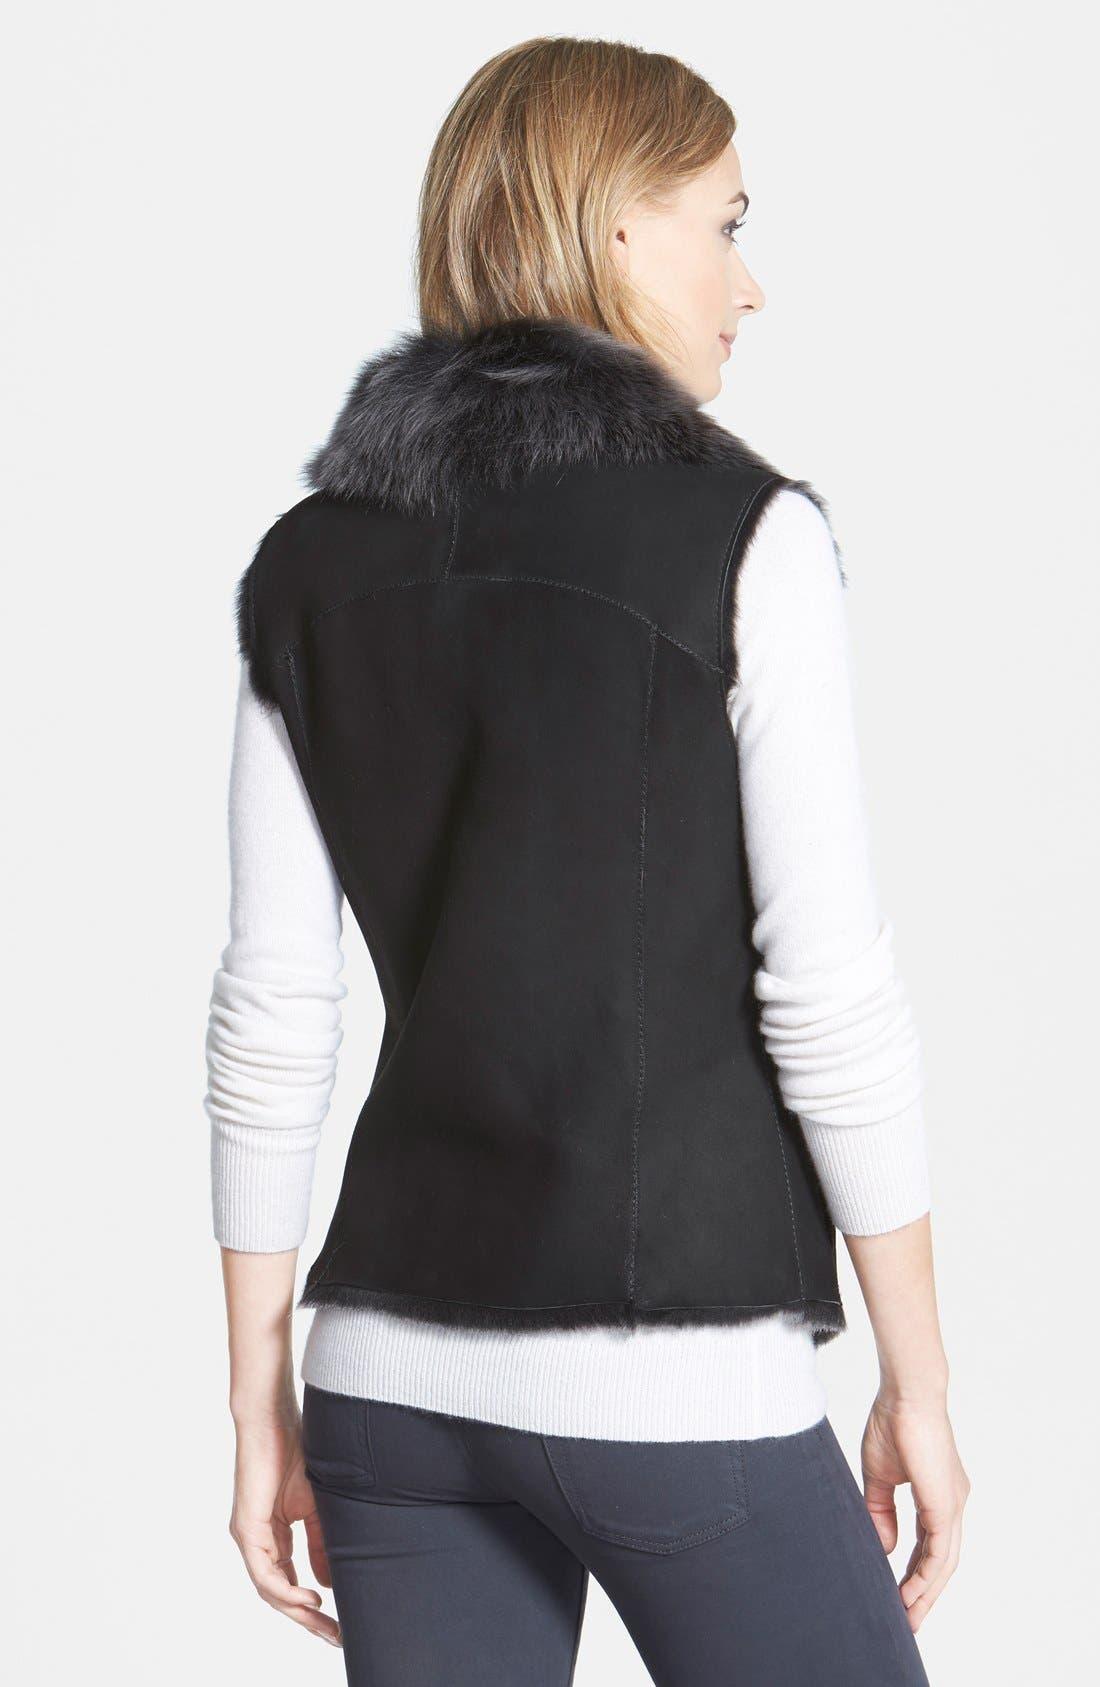 HIDESOCIETY 'Nice' Genuine Toscana Shearling Vest,                             Alternate thumbnail 3, color,                             002